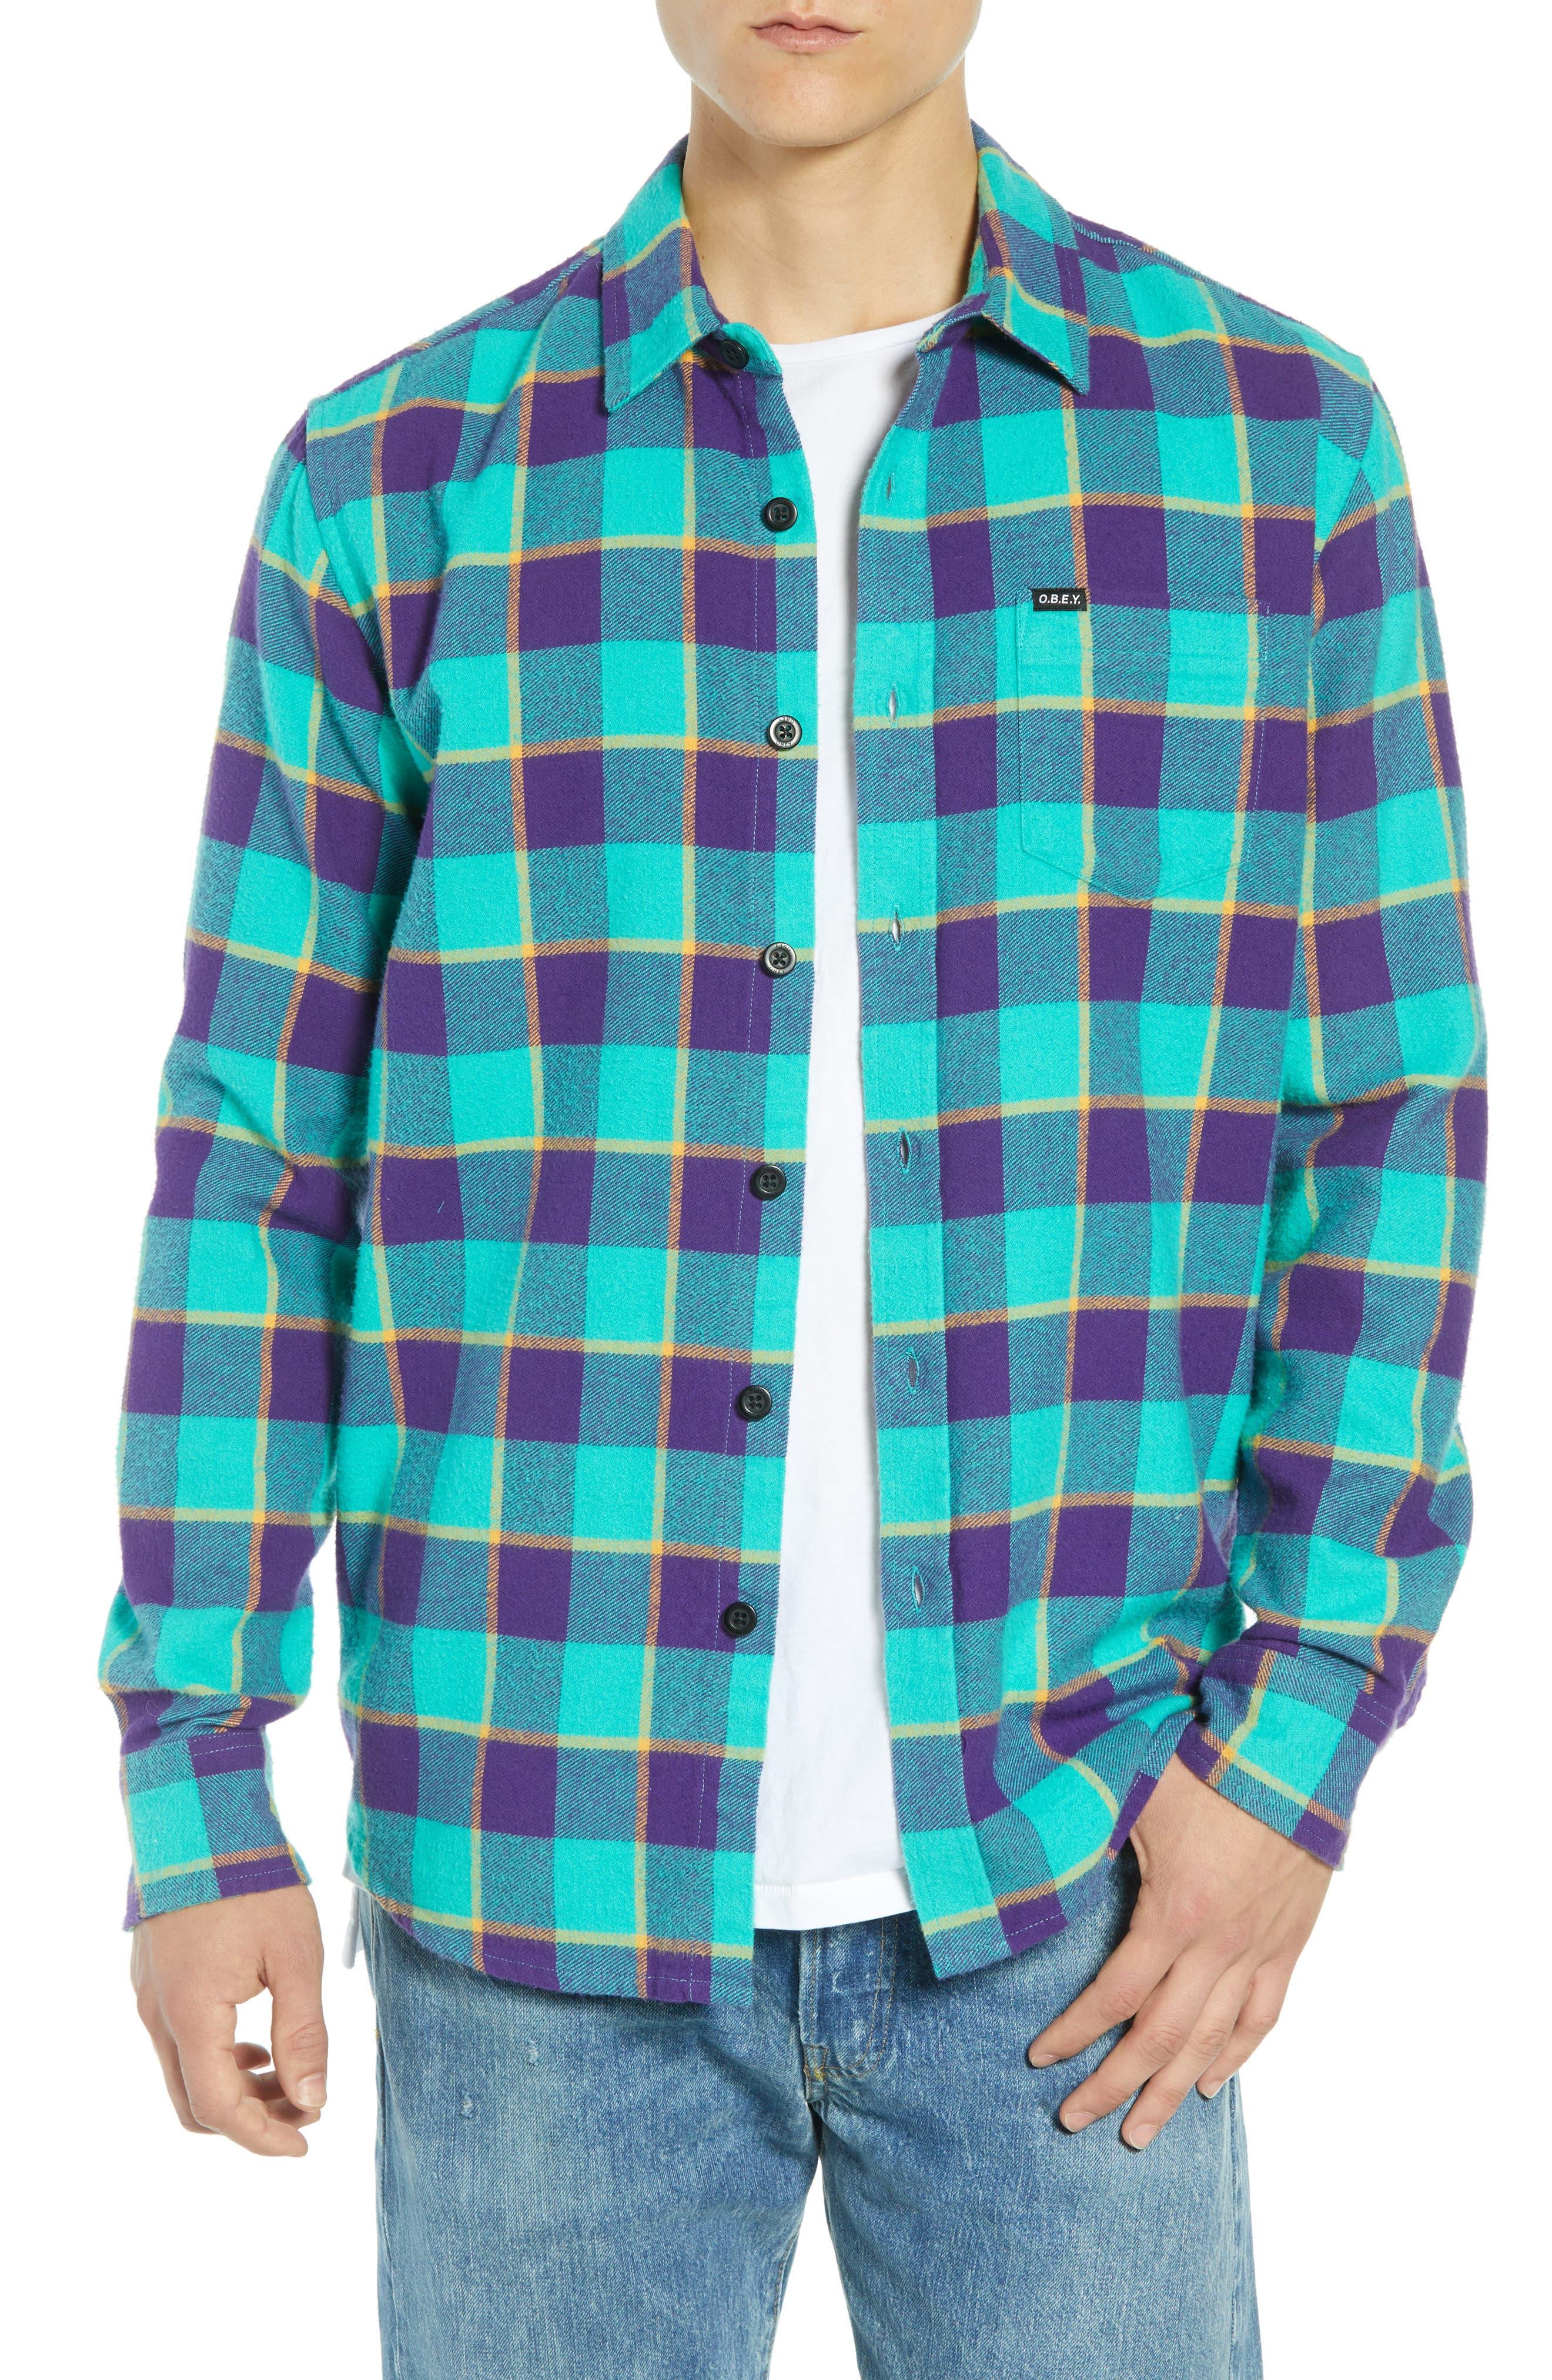 Ventura Plaid Flannel Shirt,                         Main,                         color, TEAL MULTI